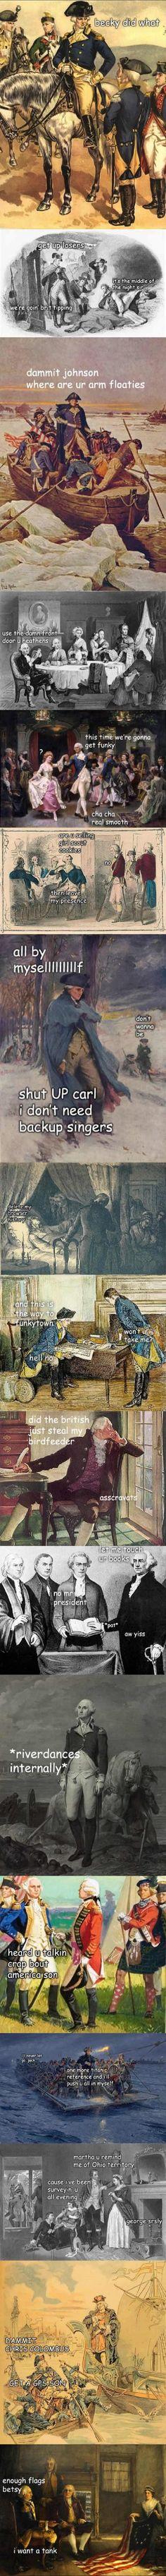 Washington's adventures